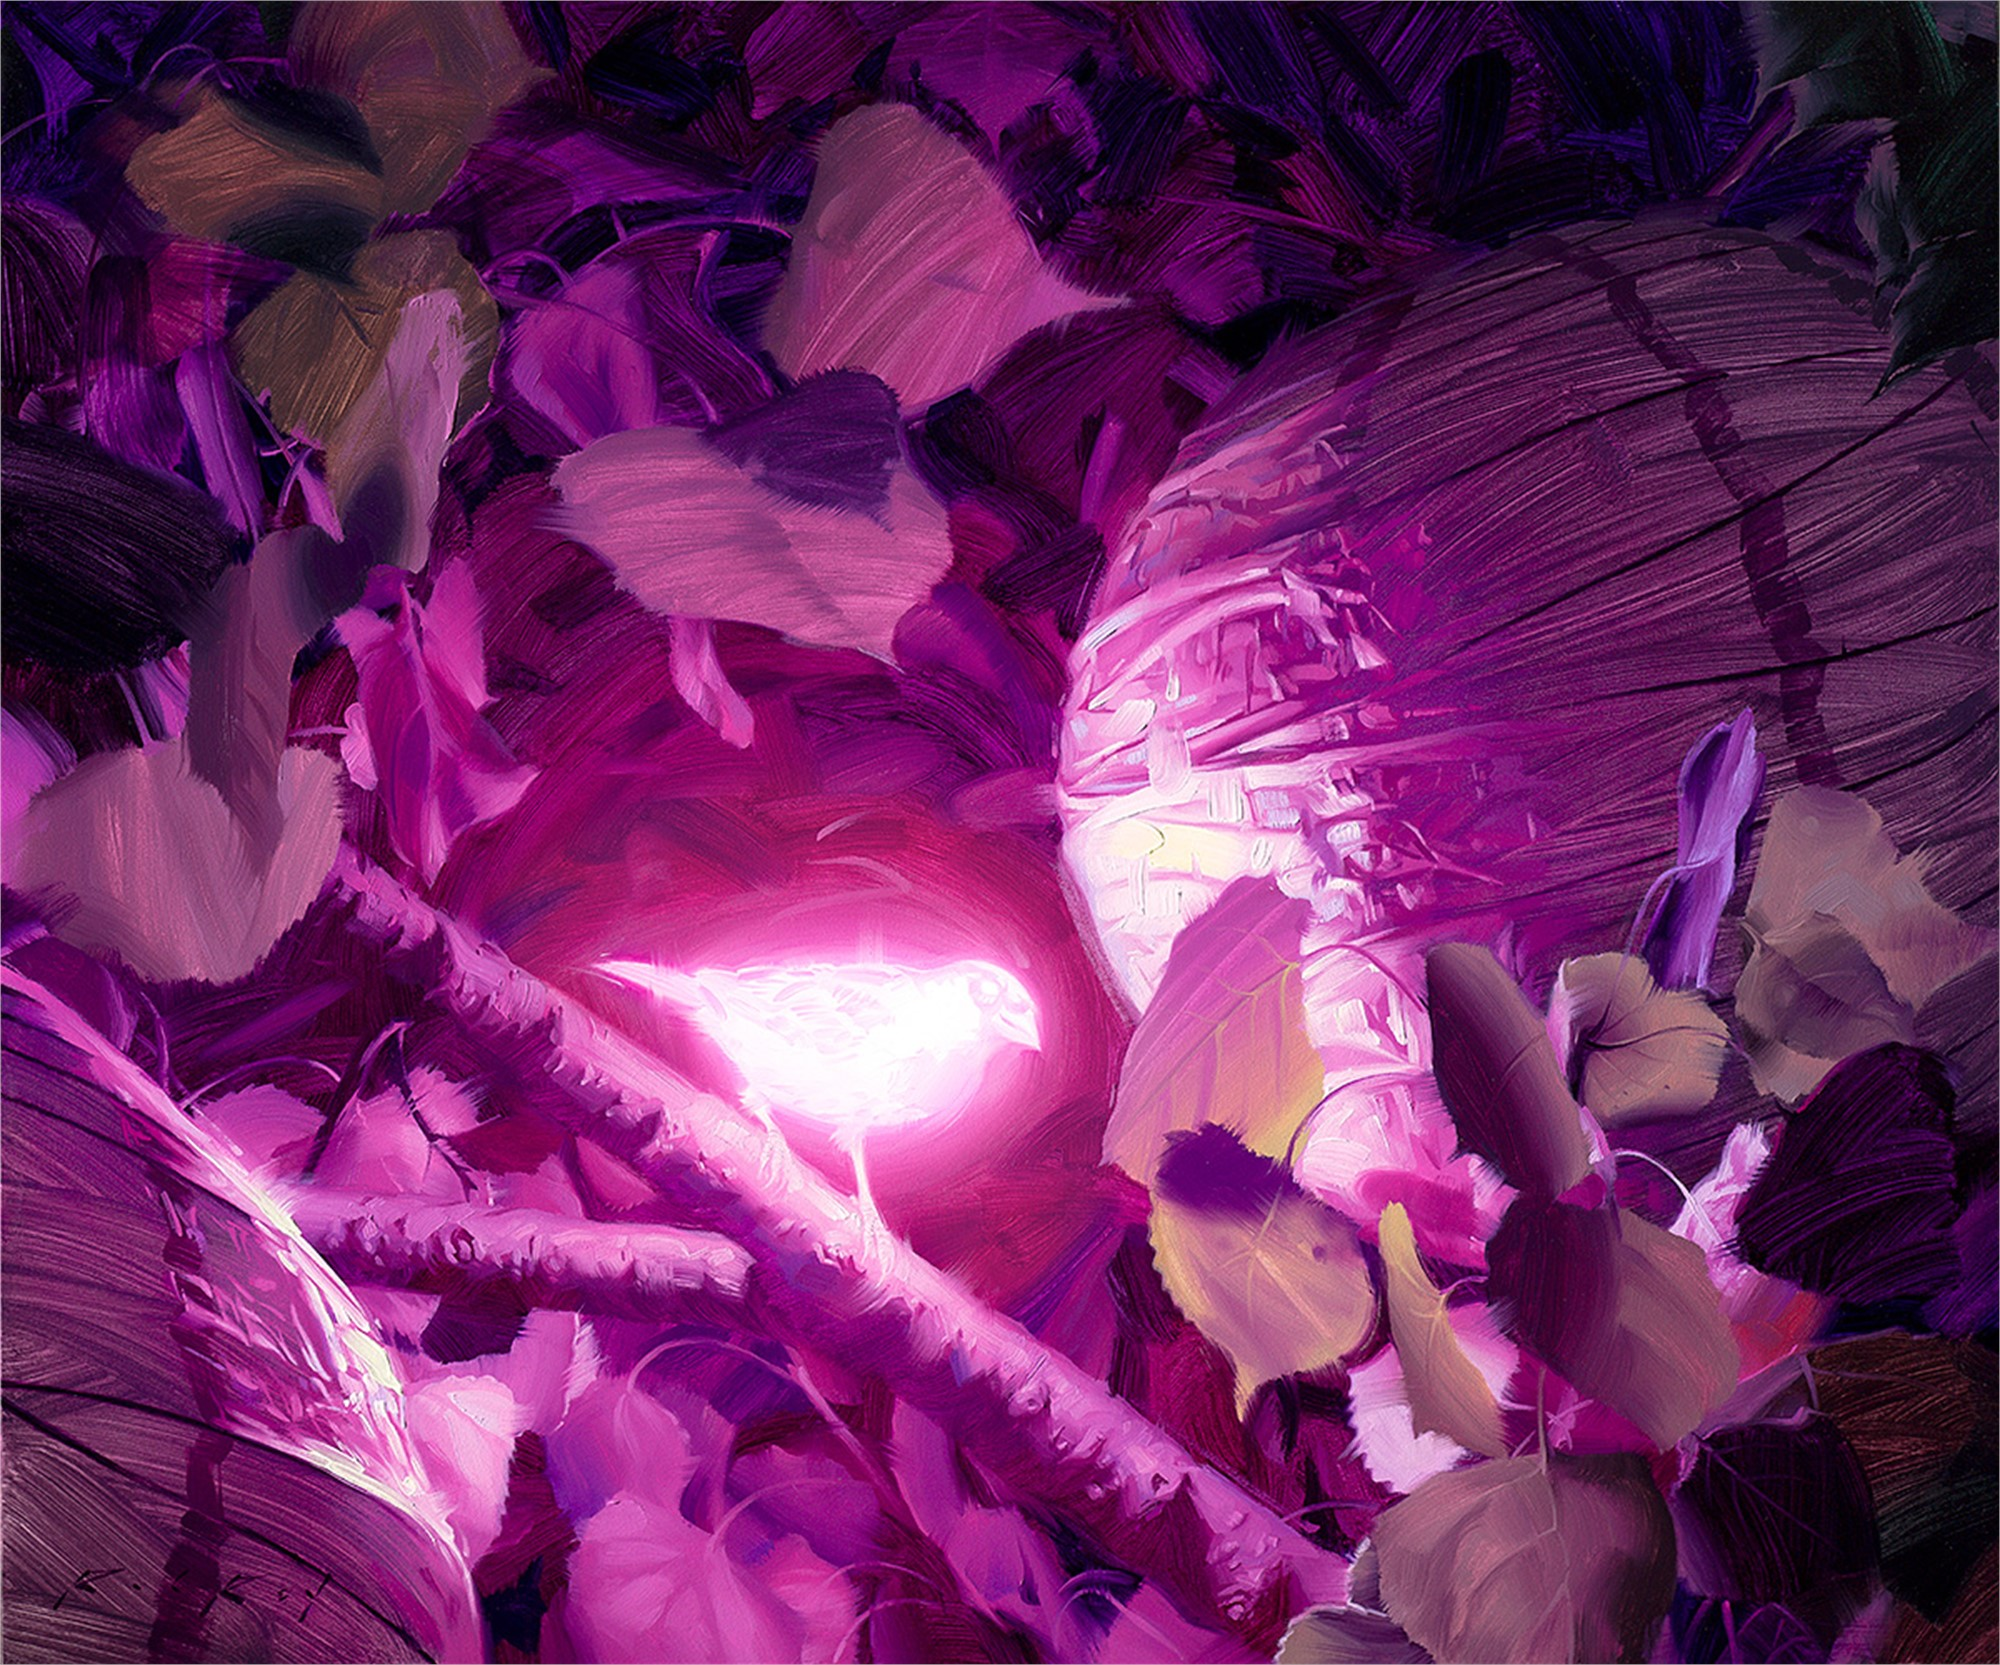 Bioluminescence 8 by Rob Rey